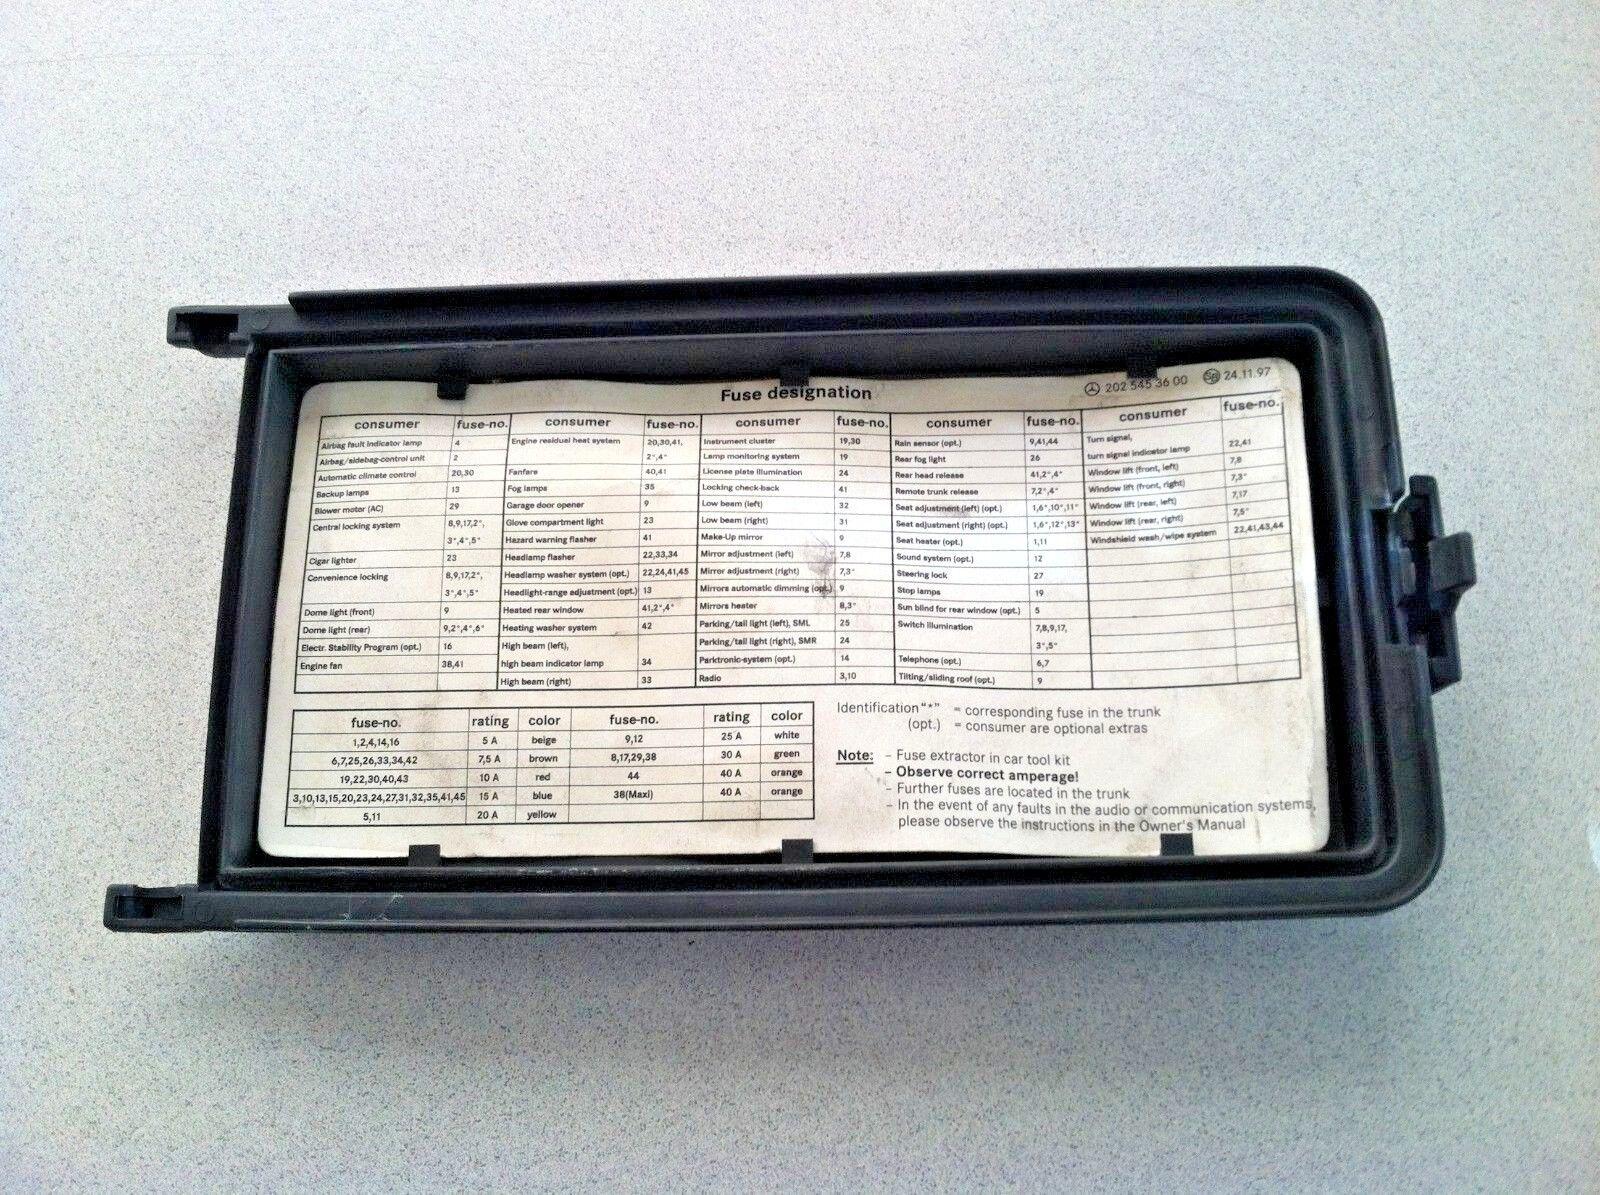 Mercedes W202 Fuse Box Location Manual Of Wiring Diagram C230 1997 2000 Benz C280 Lid Oem Part For Rh Restomods Com